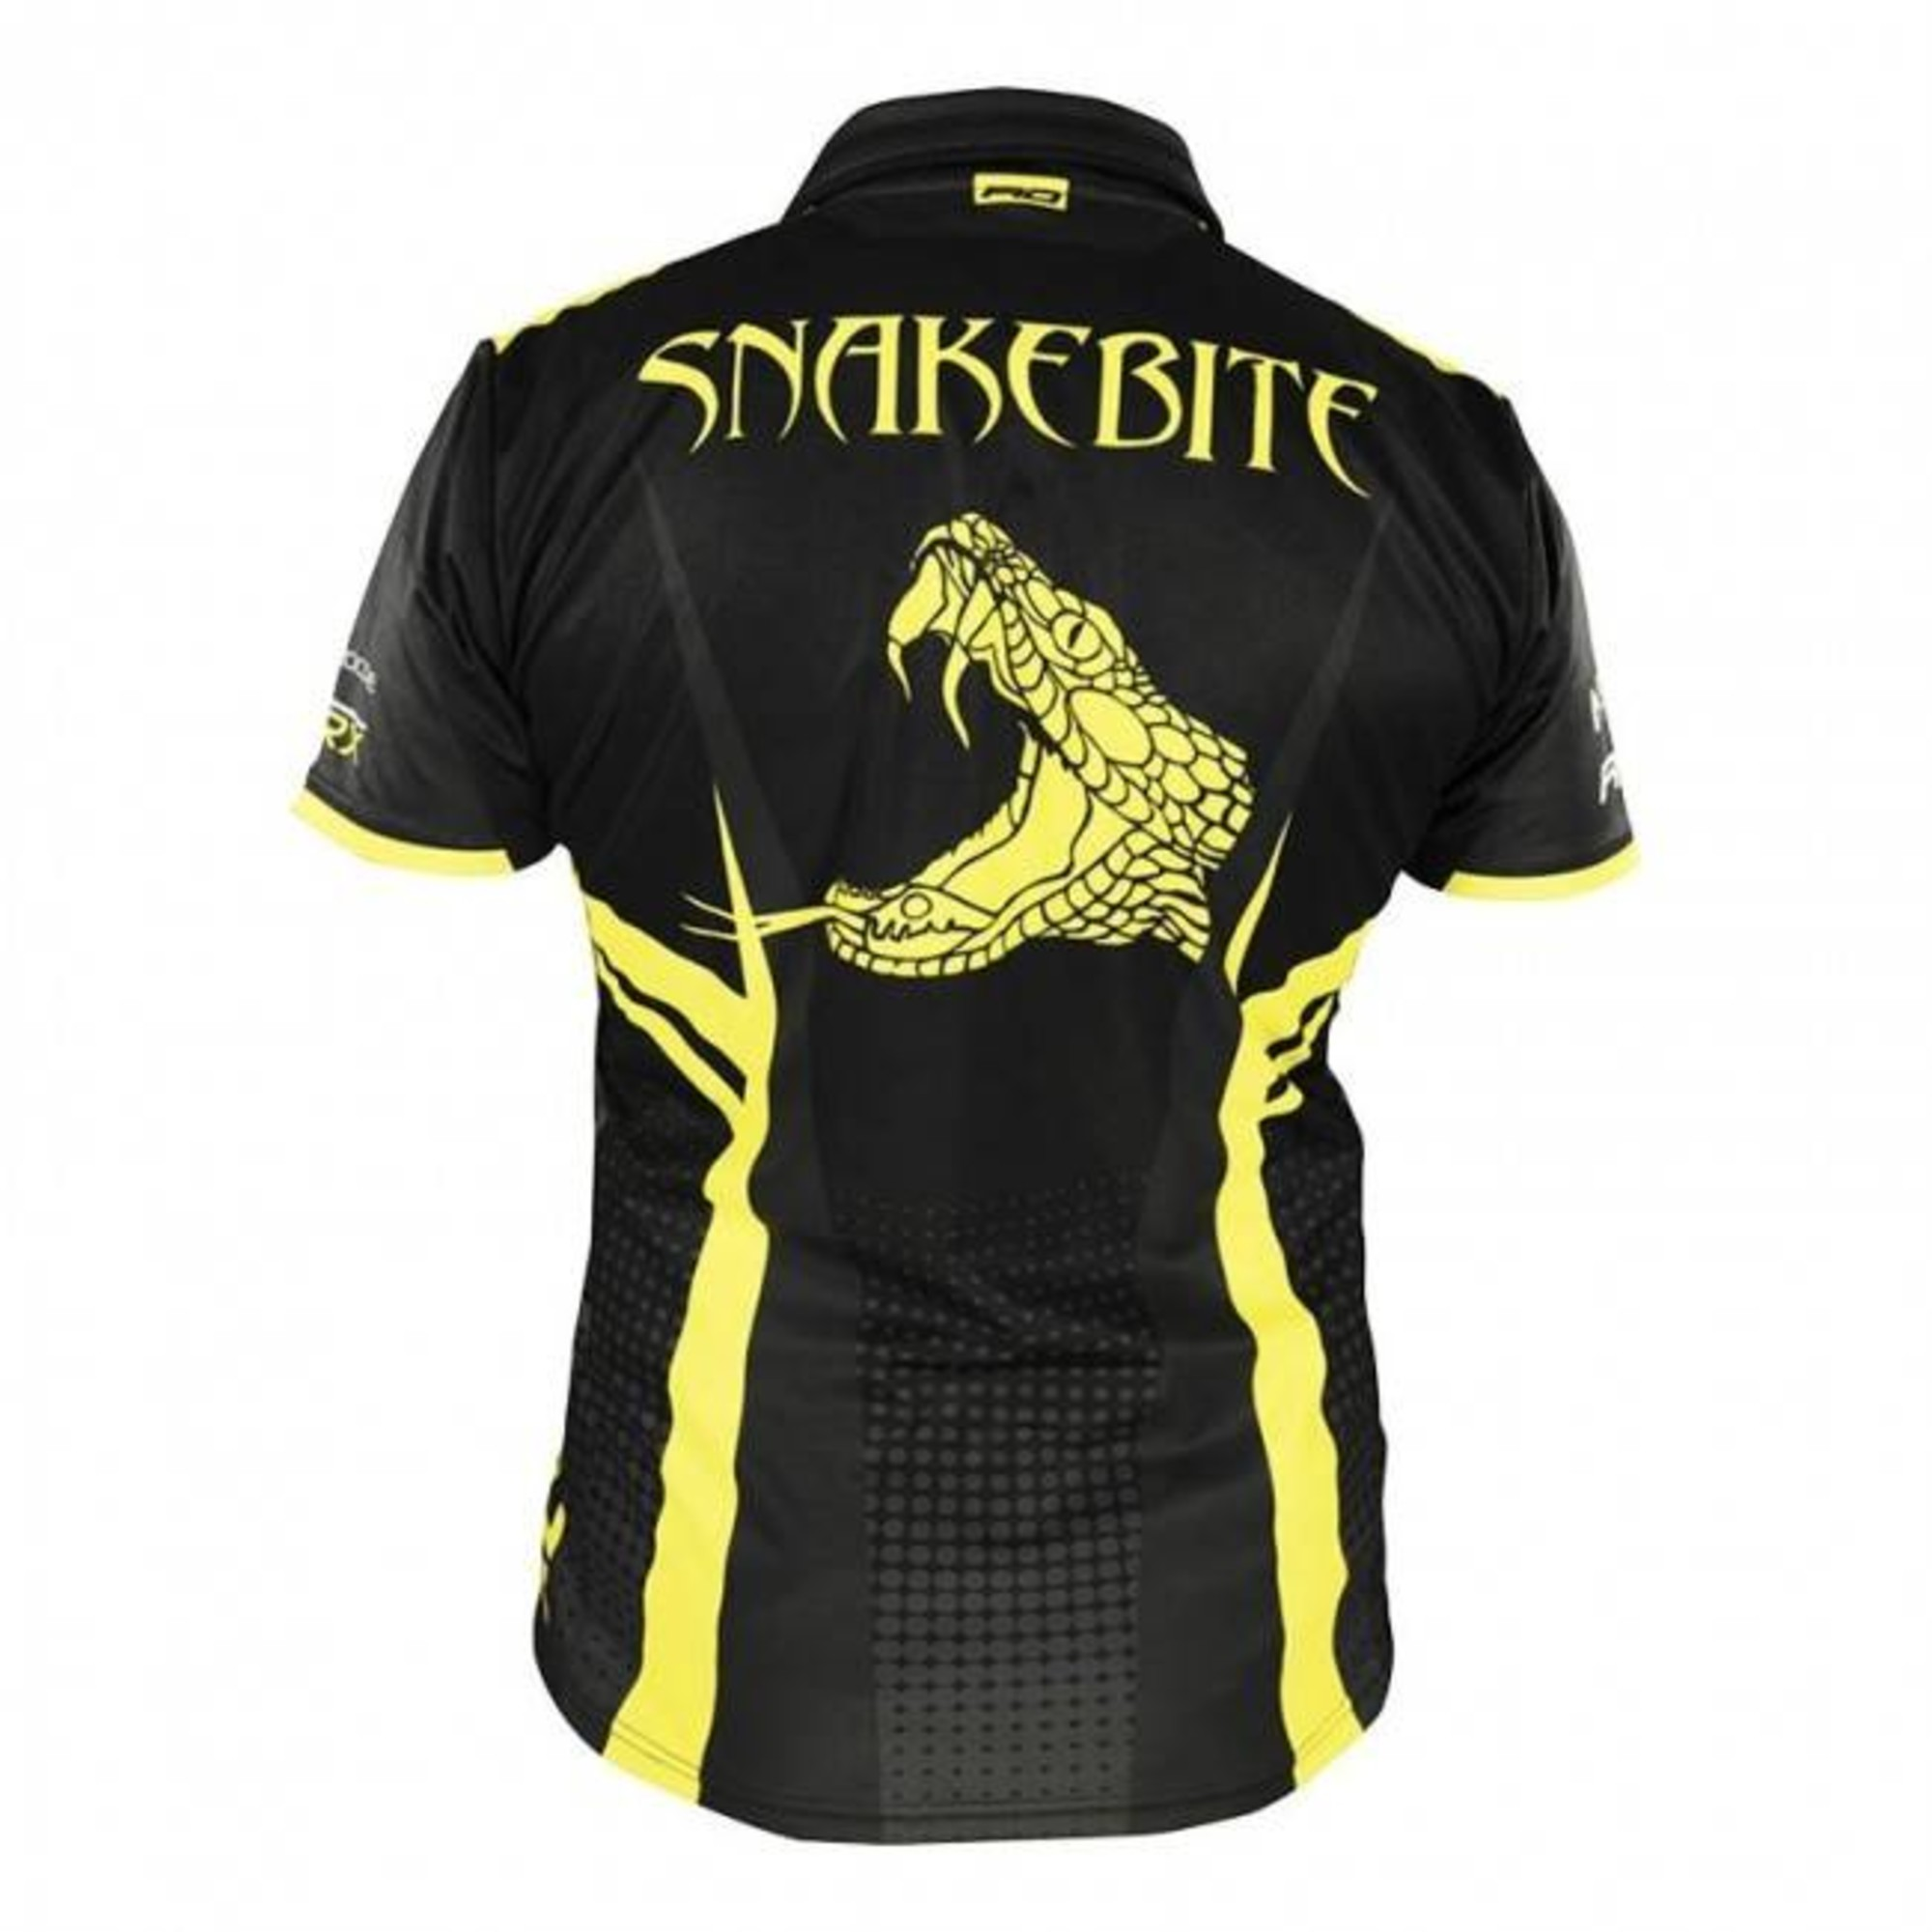 Reddragon Snakebite Tour Shirt Dartshopper De